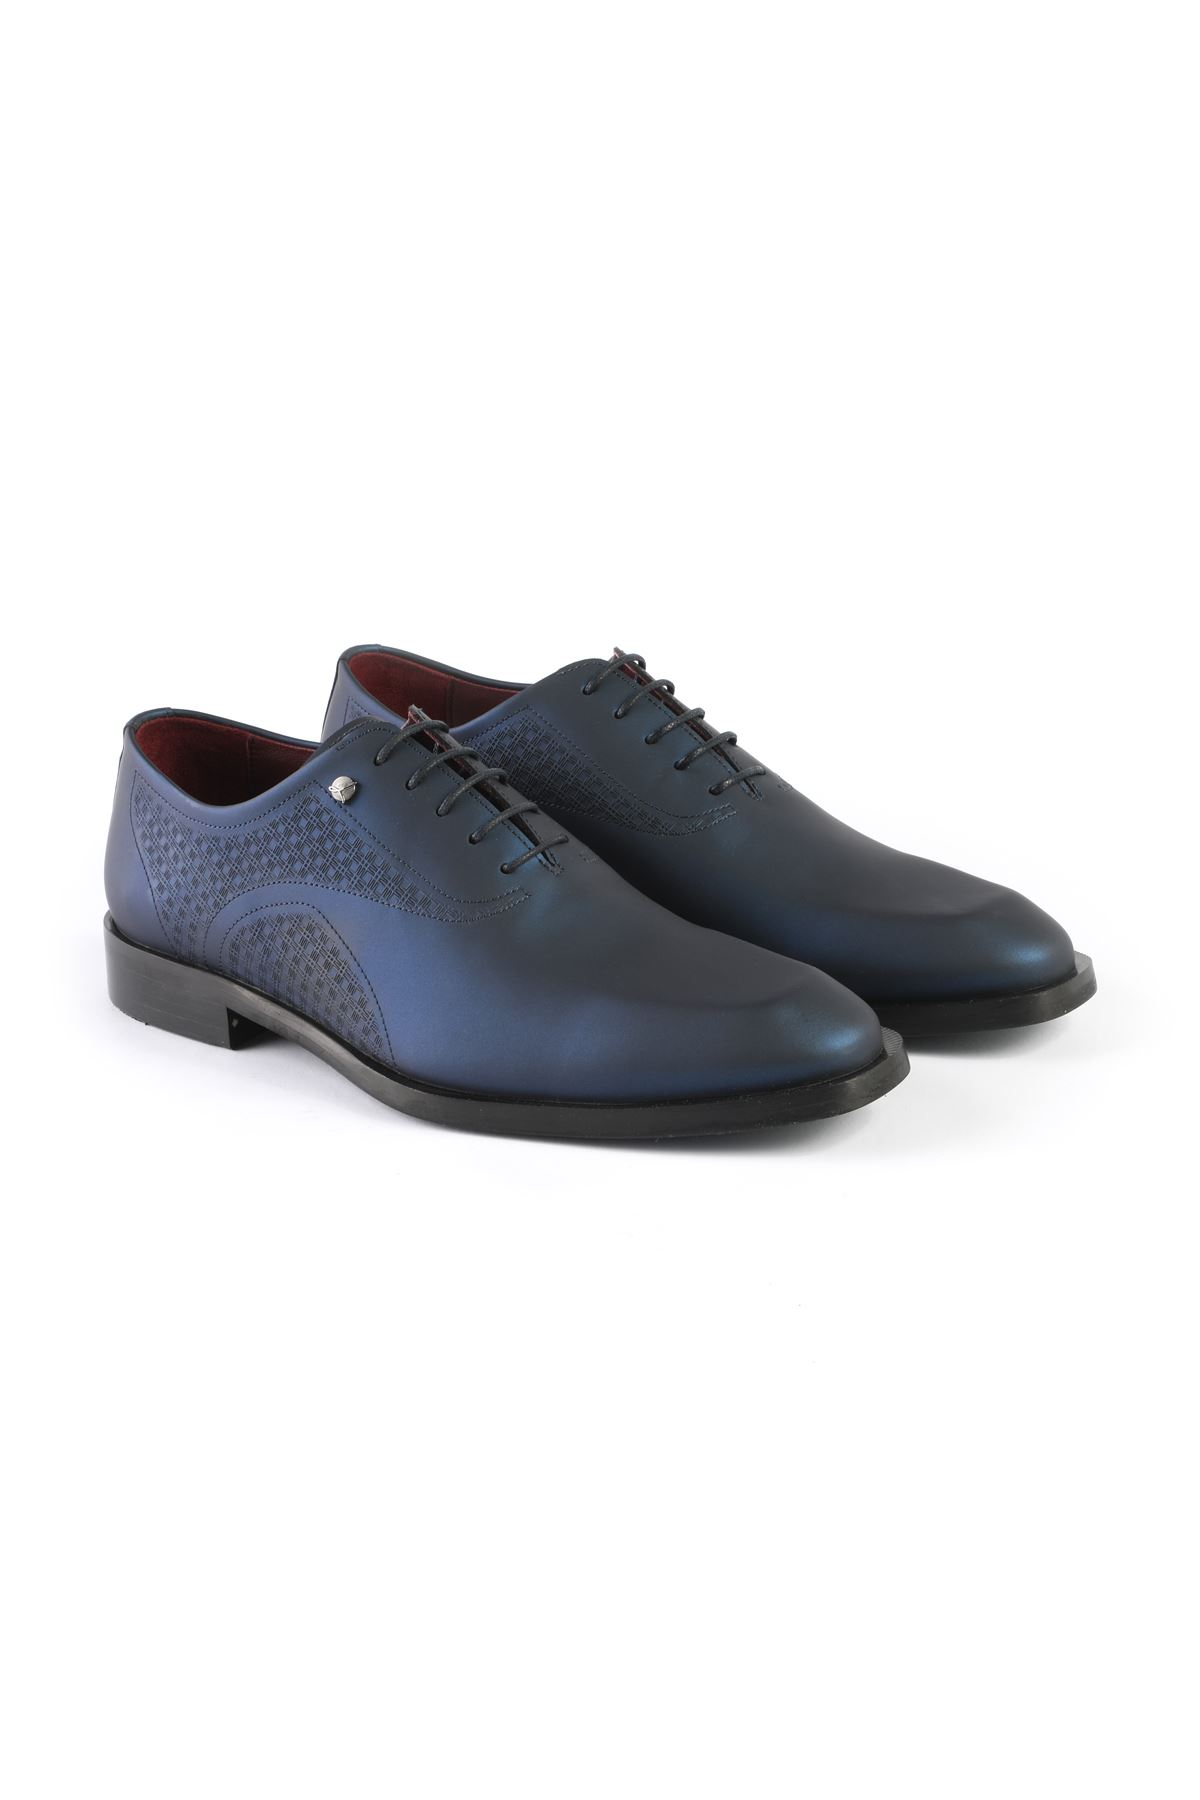 Libero 3253 Navy Blue Classic Shoes